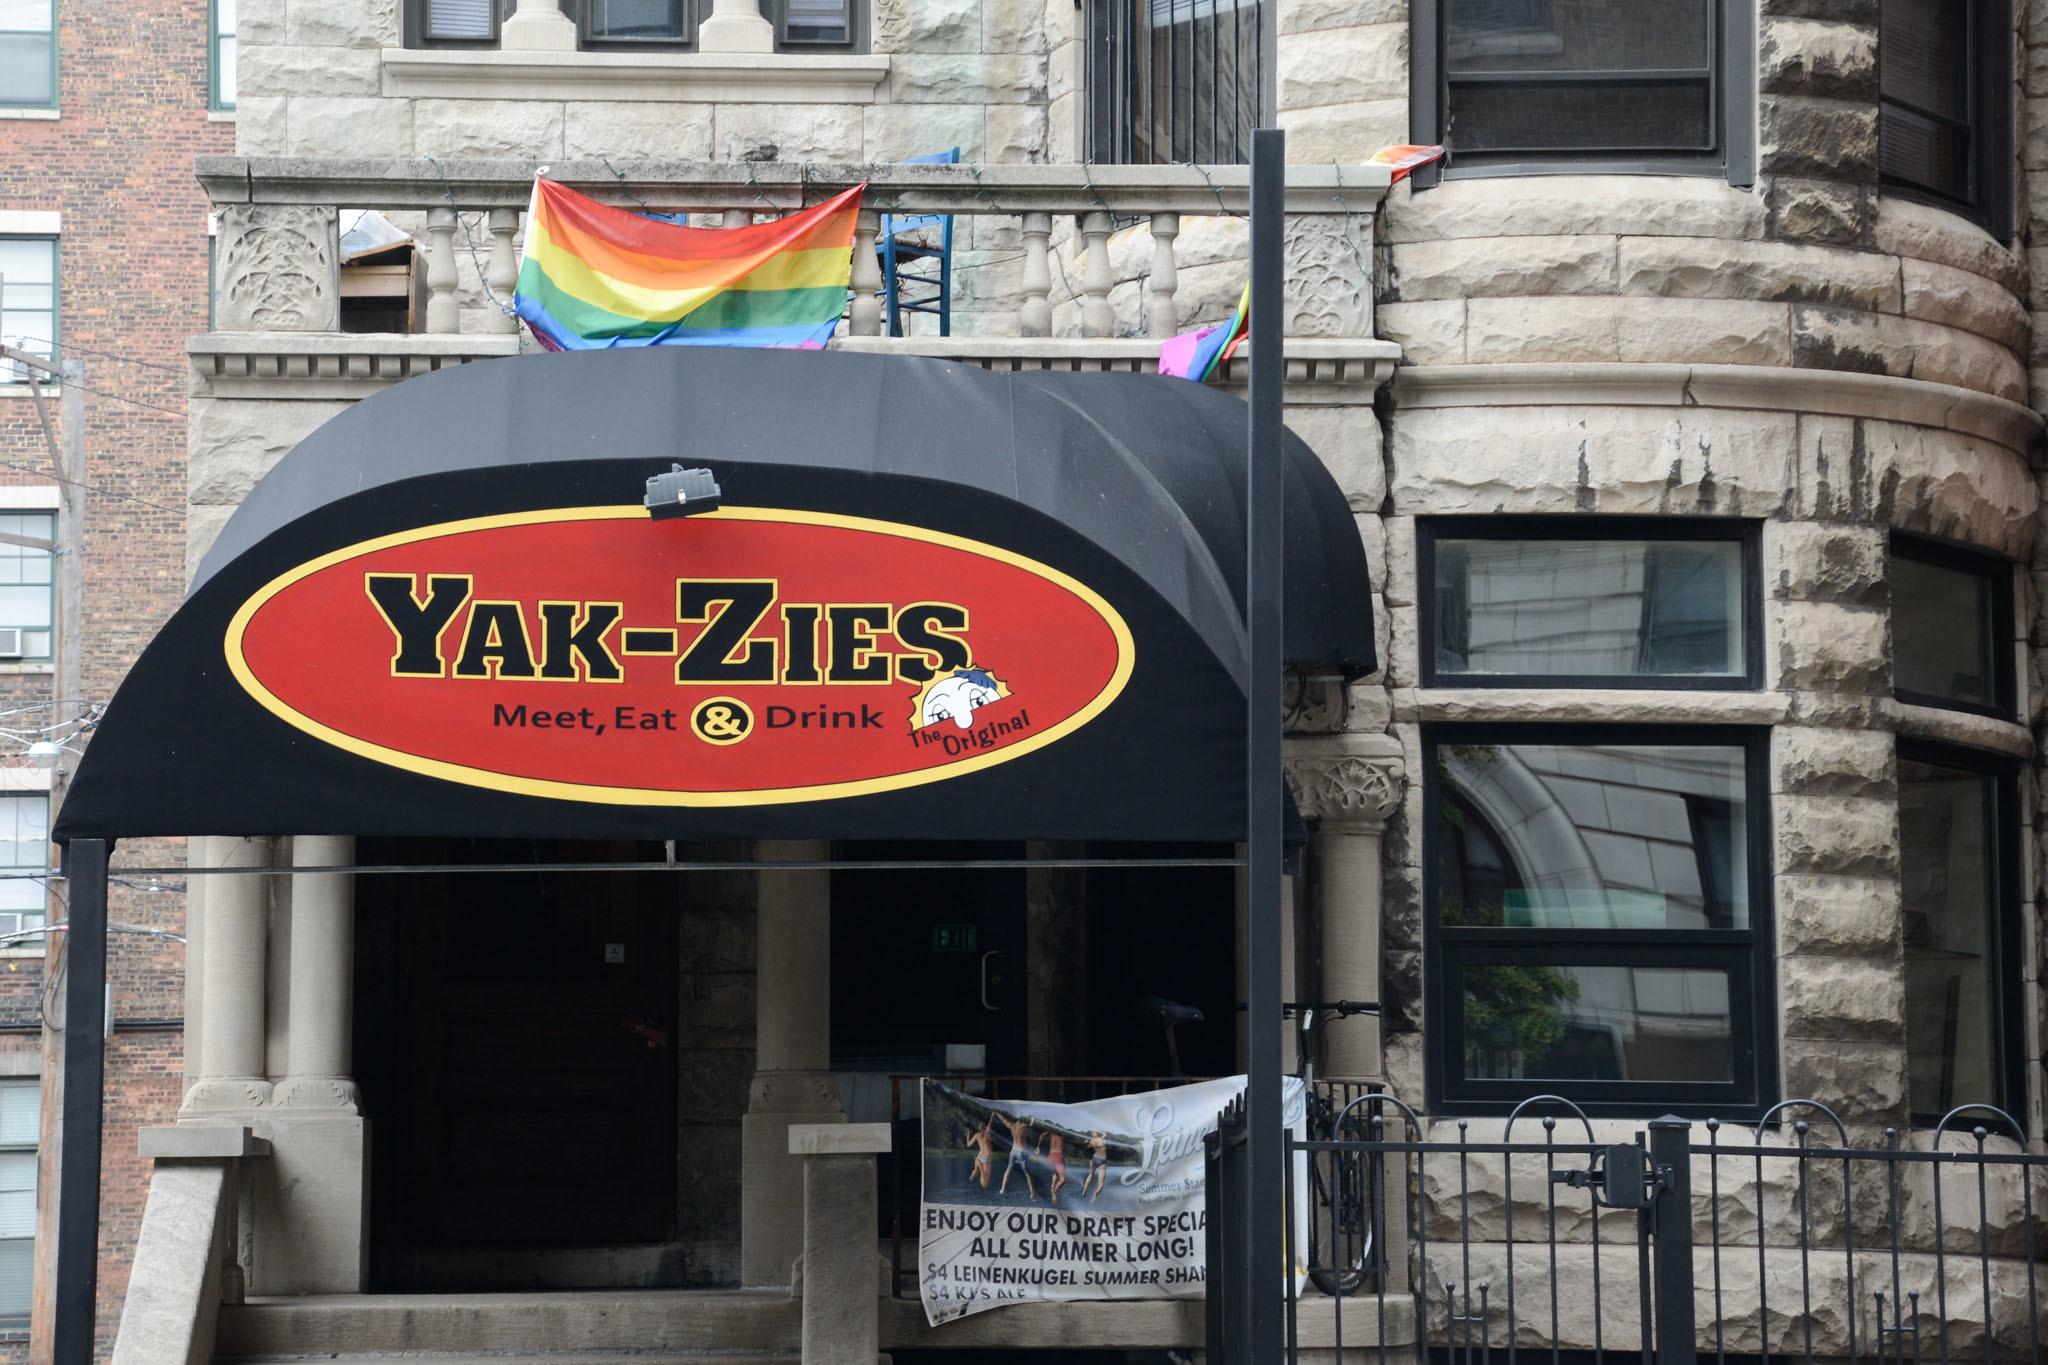 Yak-Zies Bar & Grill